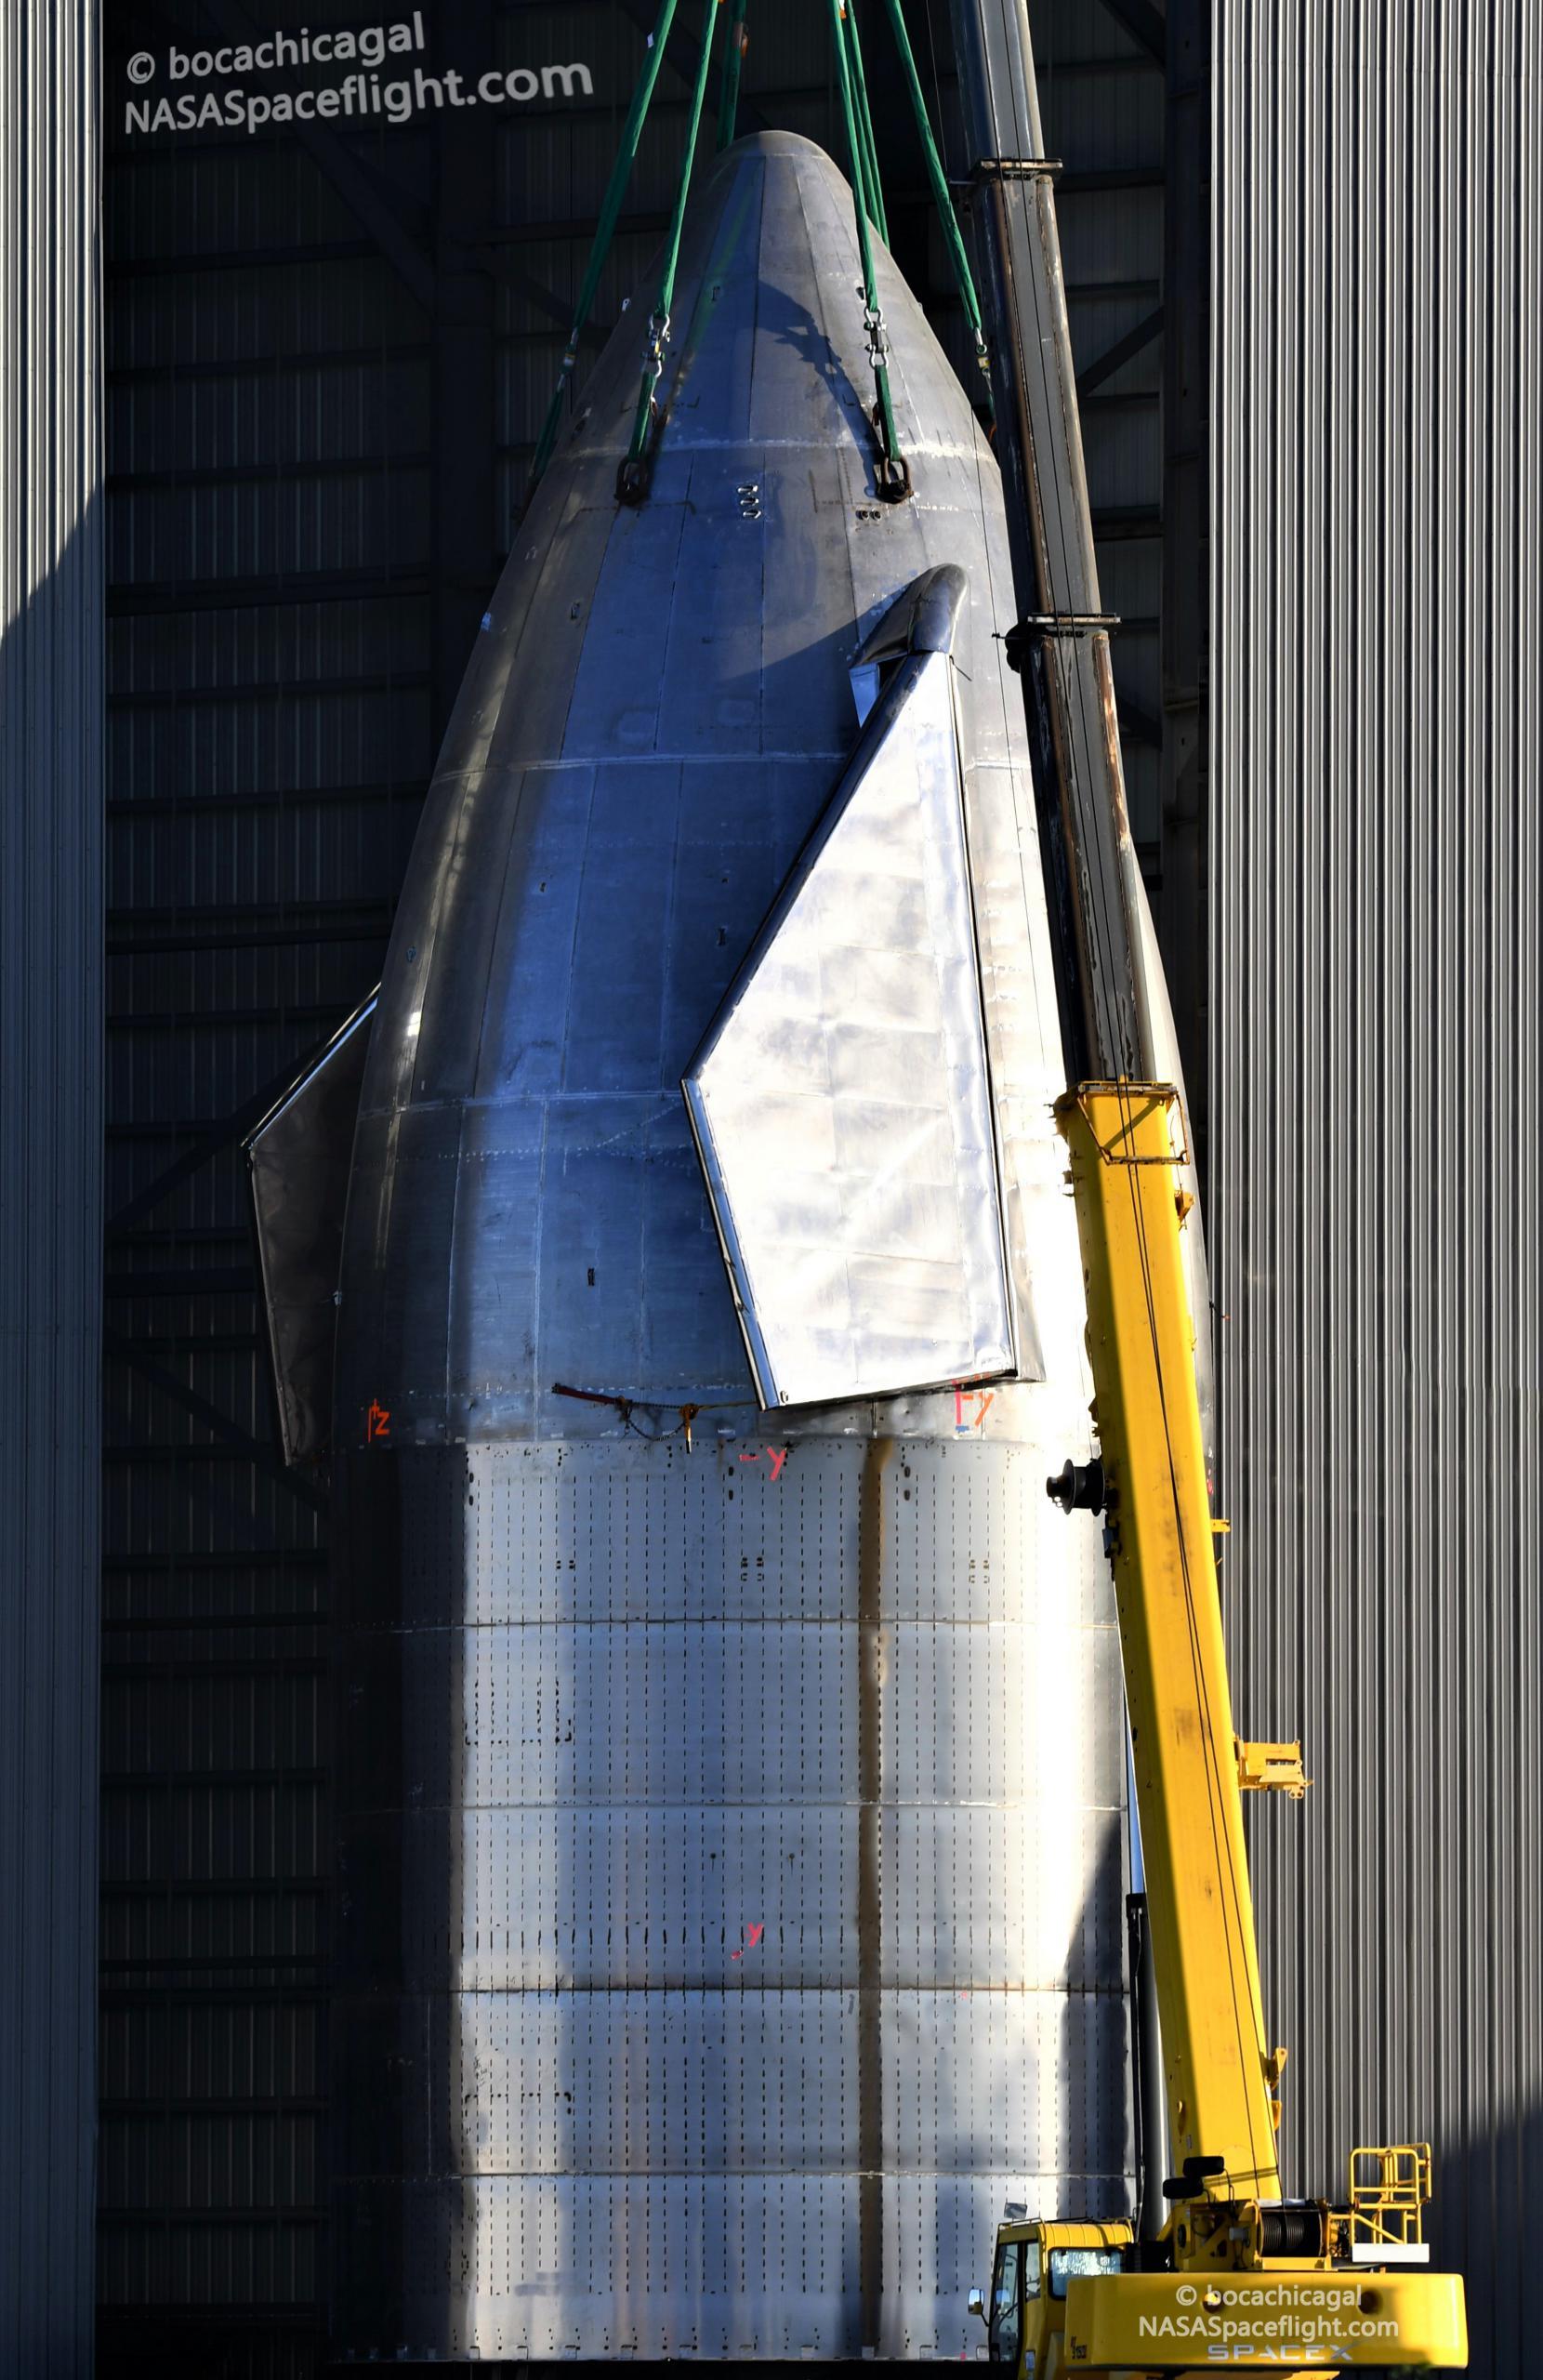 Starship Boca Chica 101920 (NASASpaceflight – bocachicagal) SN8 nosecone stack 6 (c)